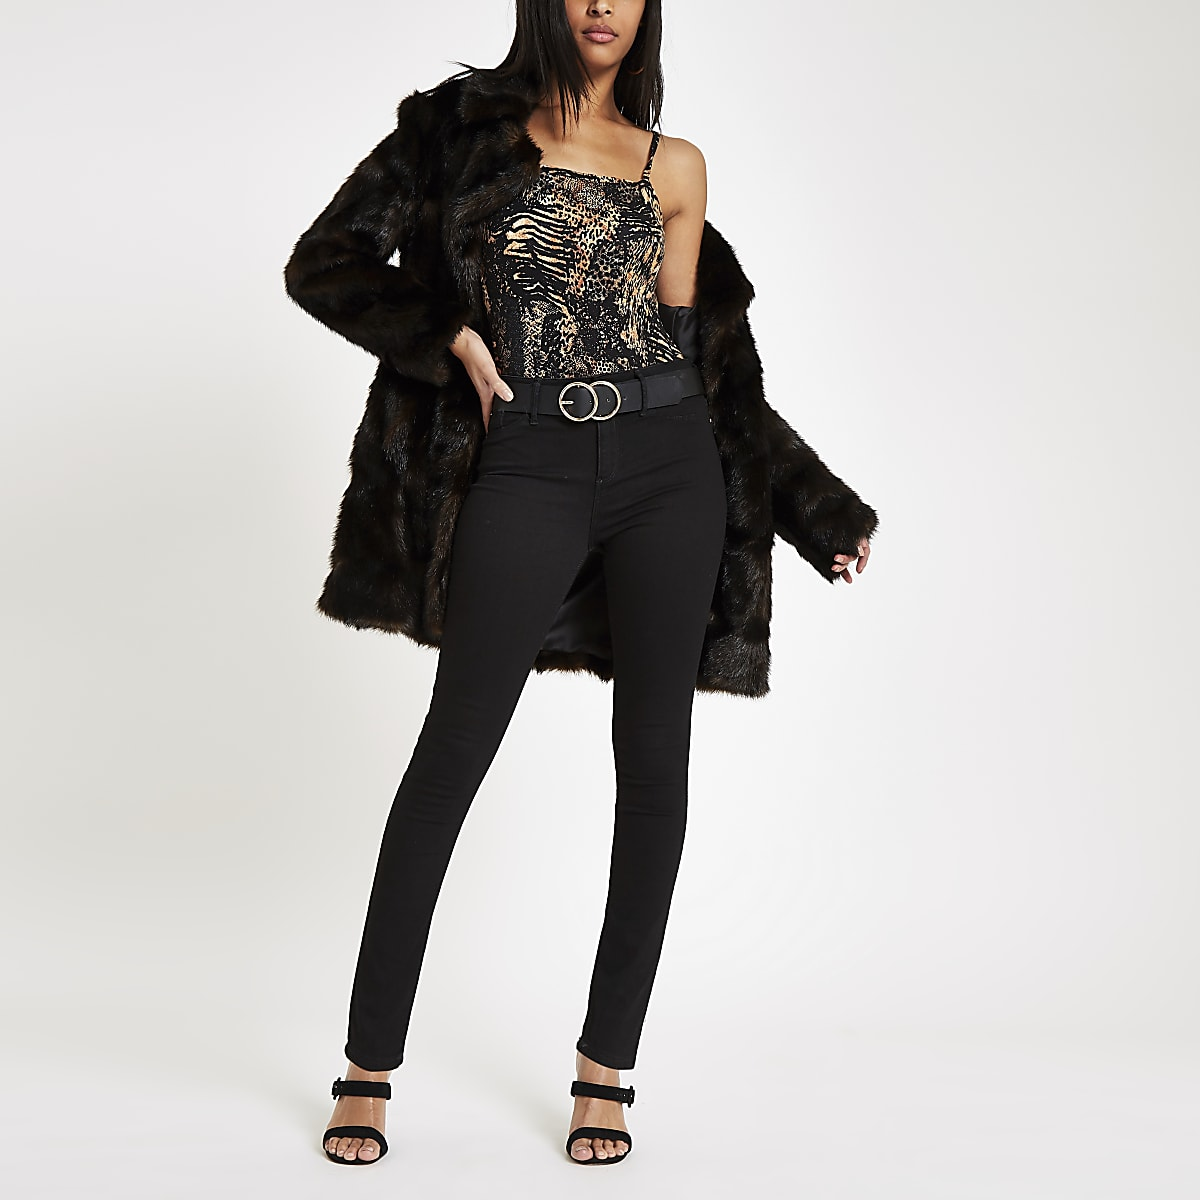 Brown animal print bodysuit